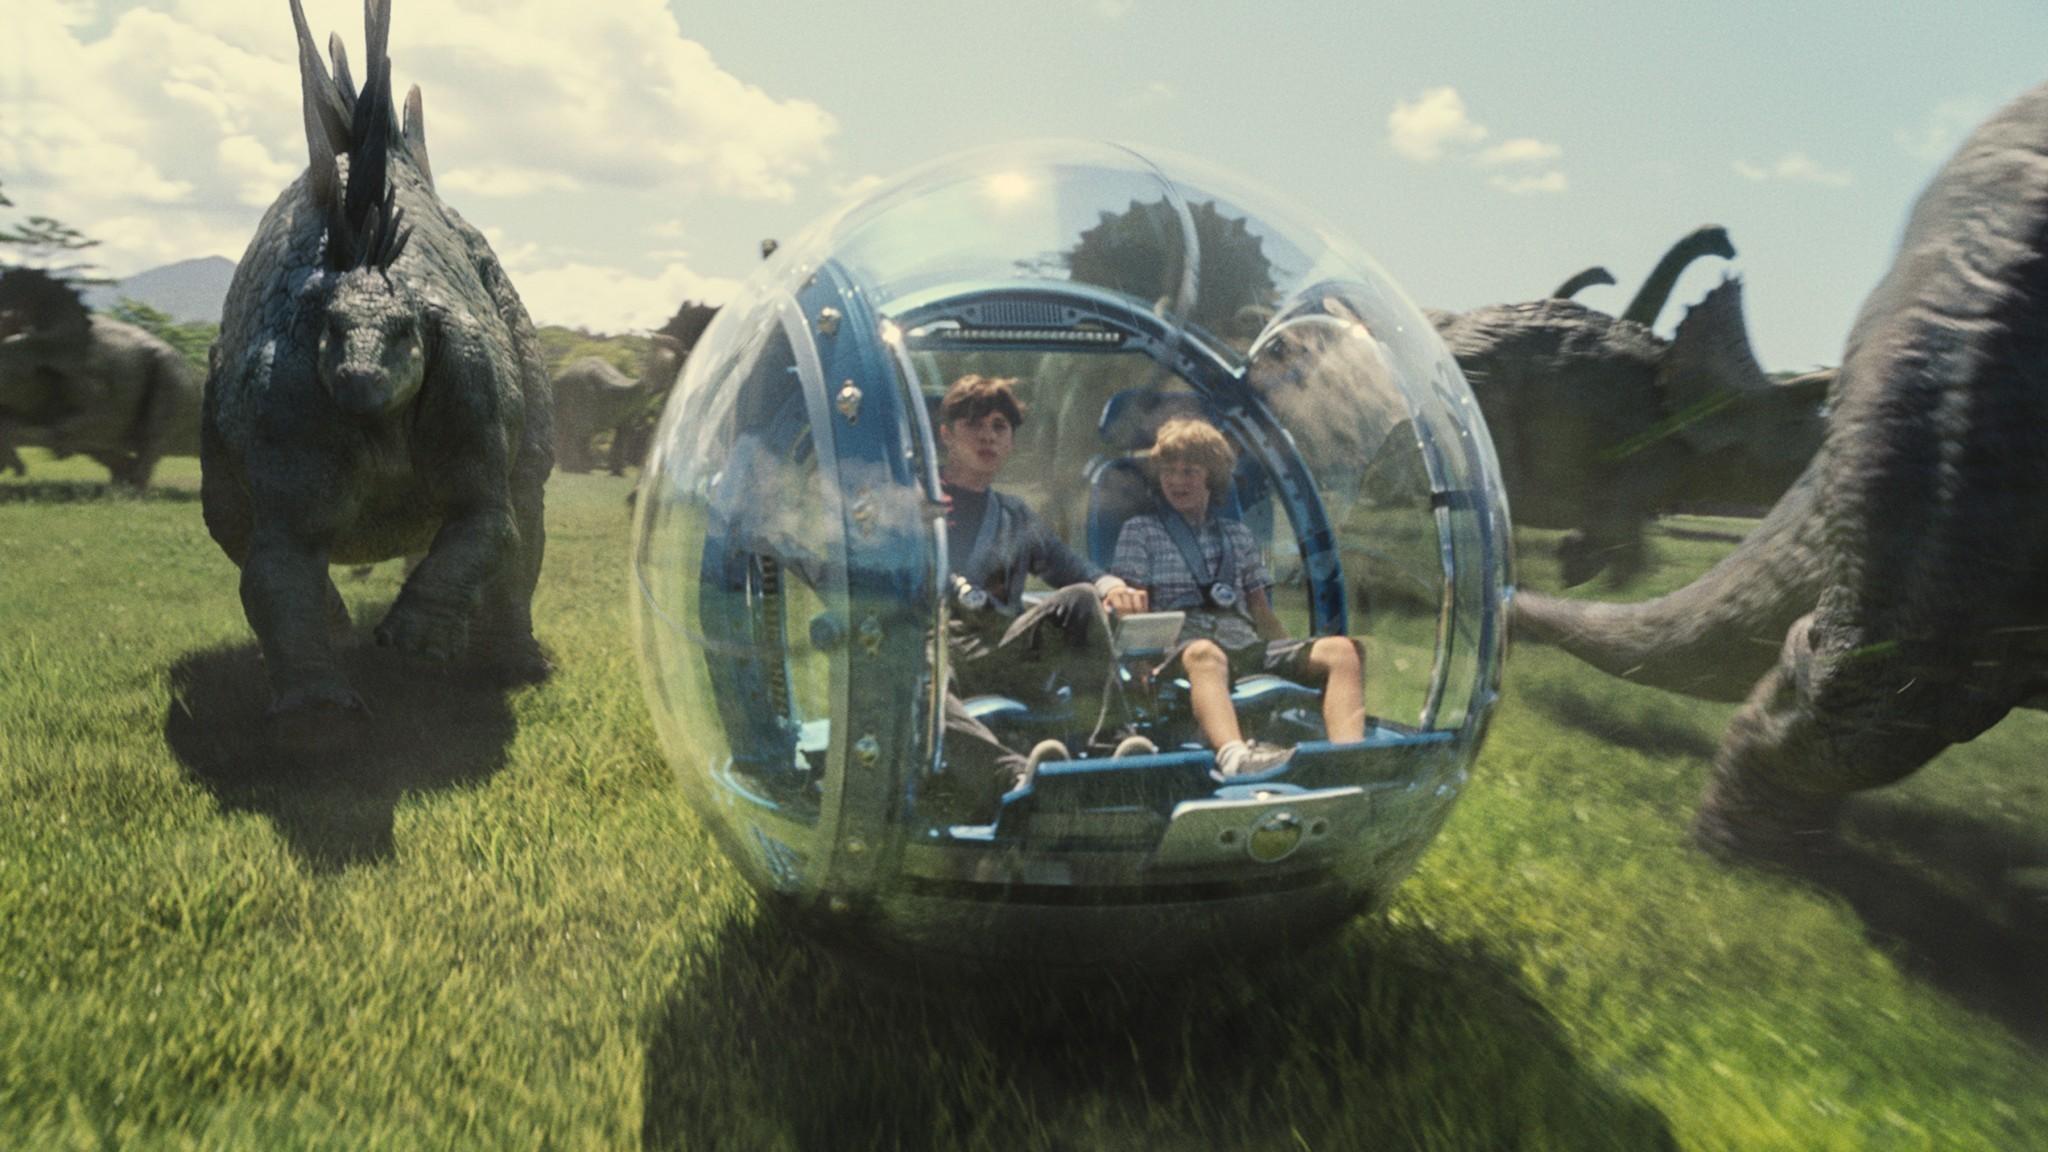 Jurassic World - image